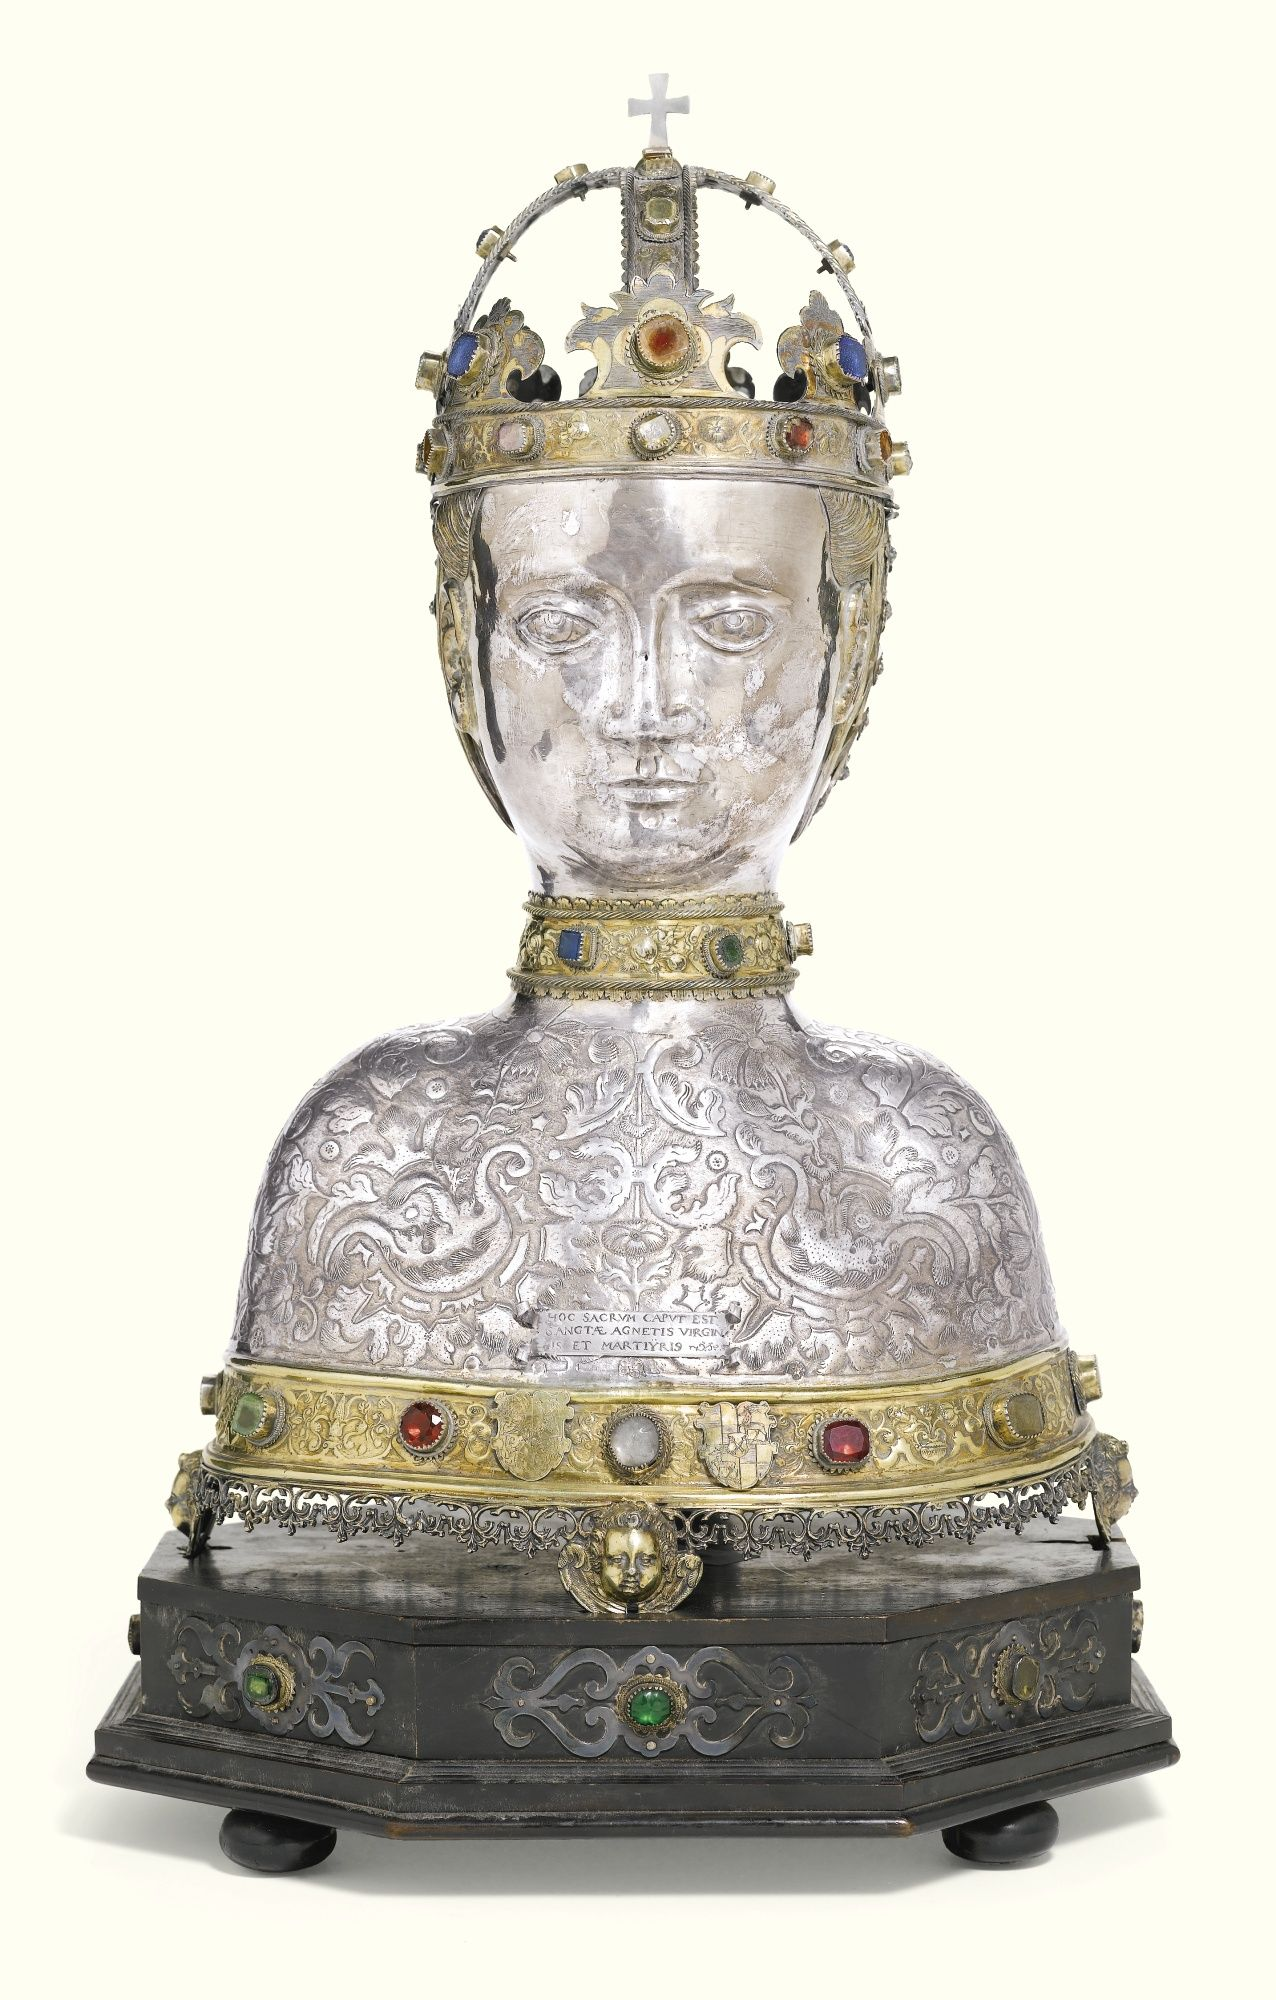 Reliquary bust of St. Agnès (South German, circa 1600) - Sotheby's